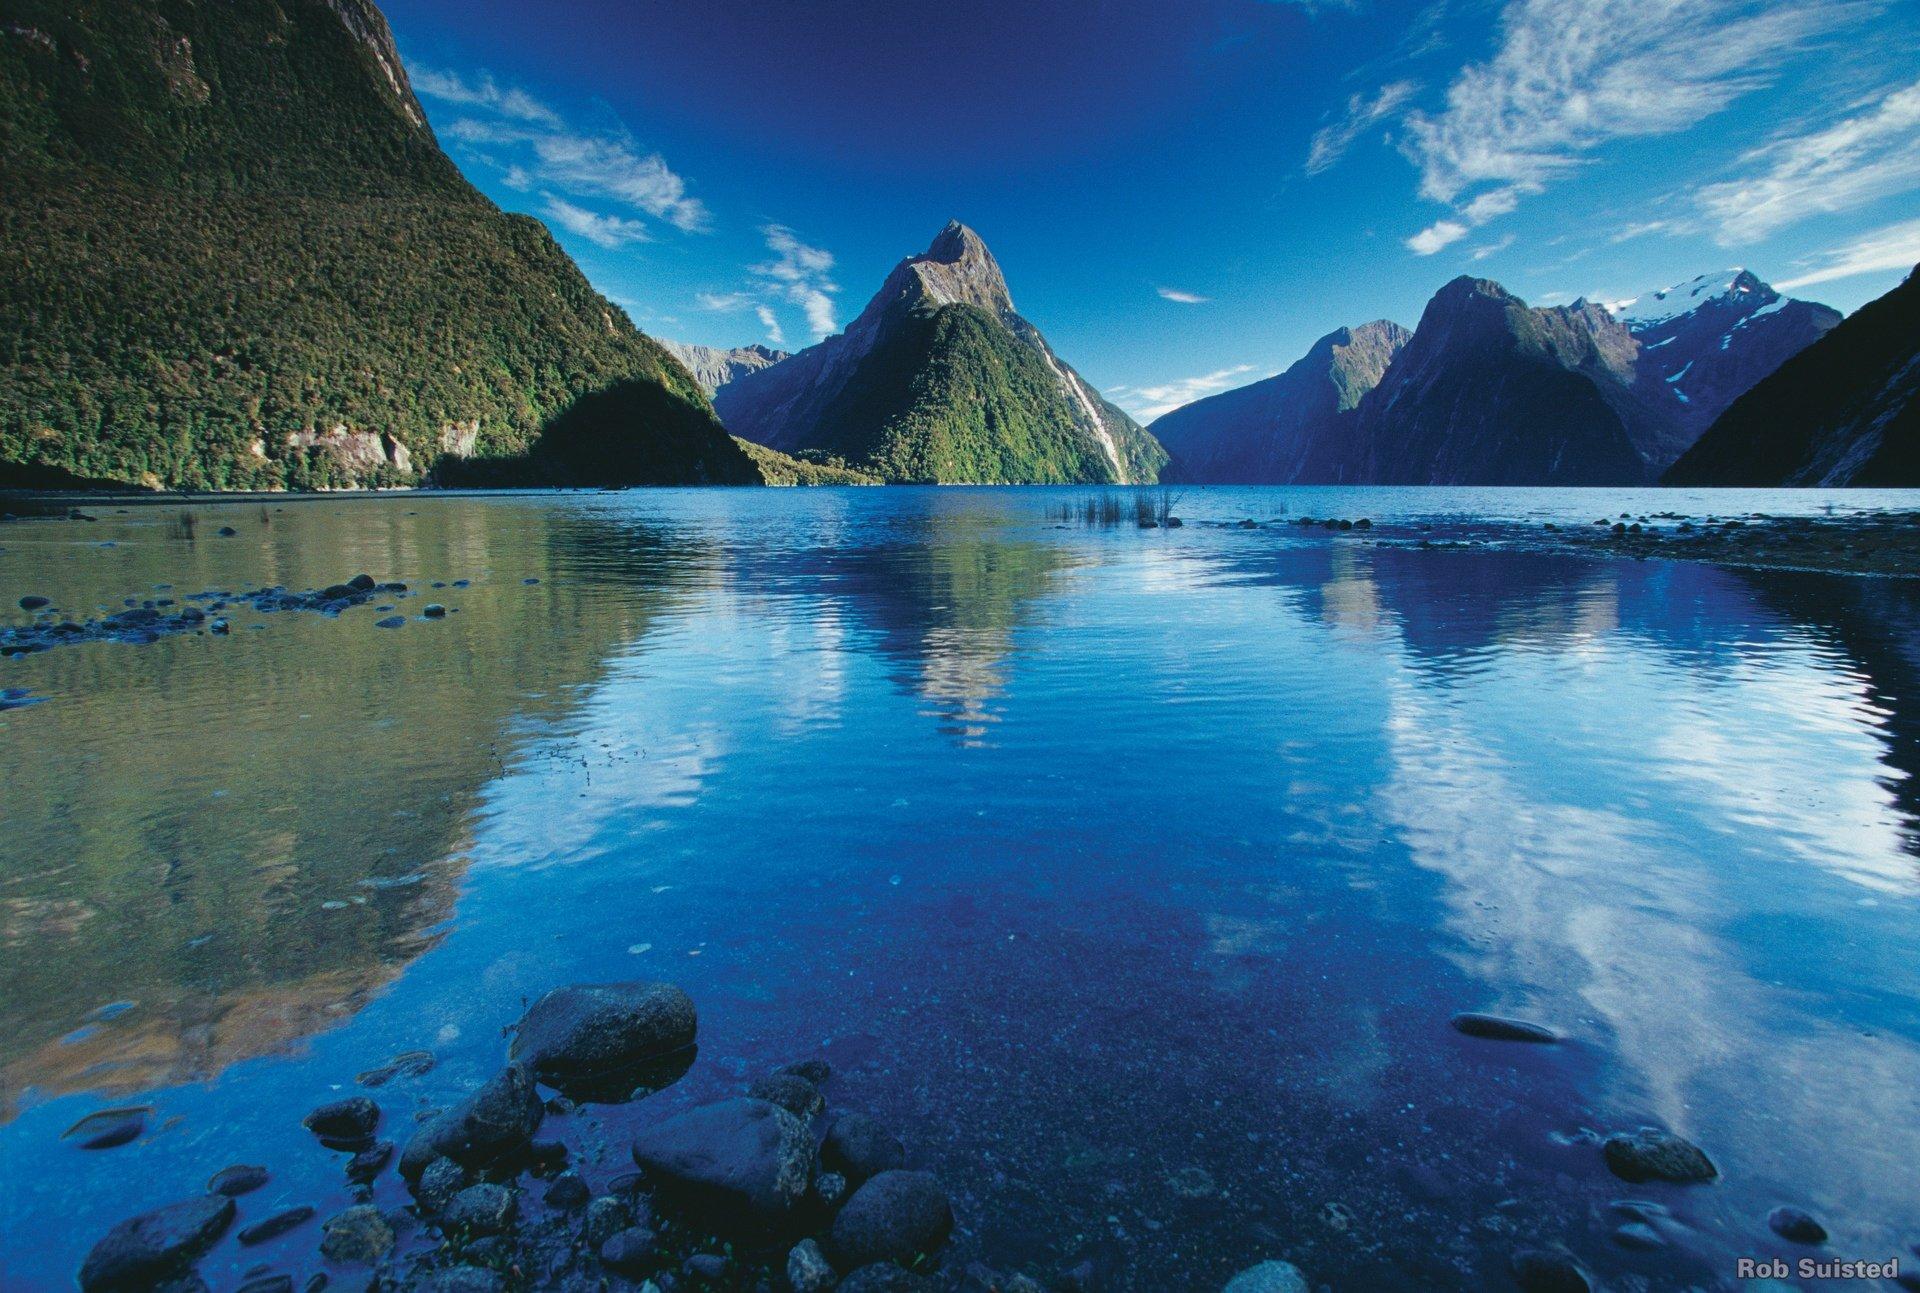 8-Day New Zealand Highlights - New Zealand Itinerary